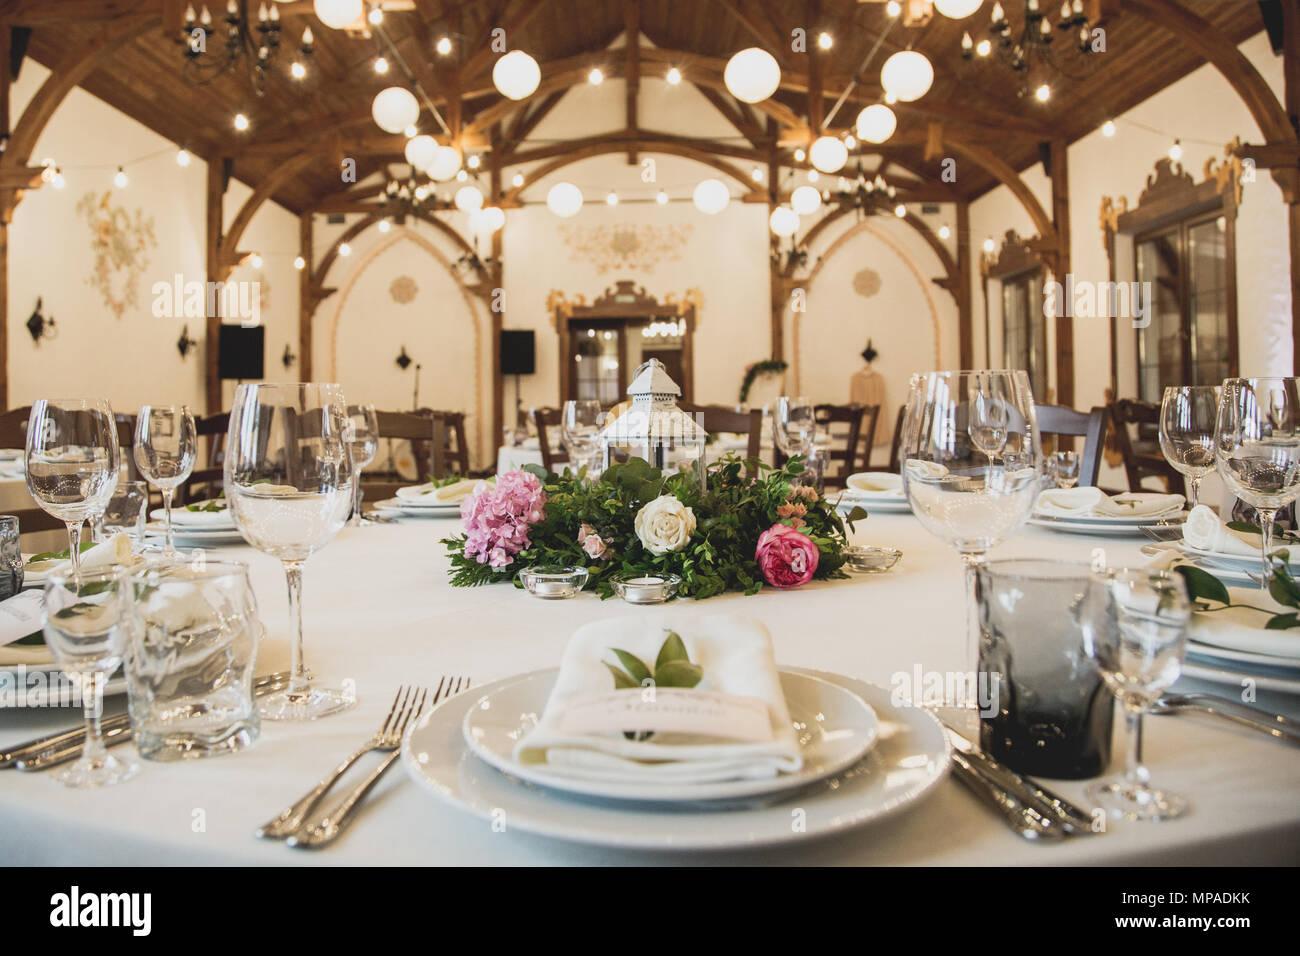 Cheap Wedding Reception Decorations